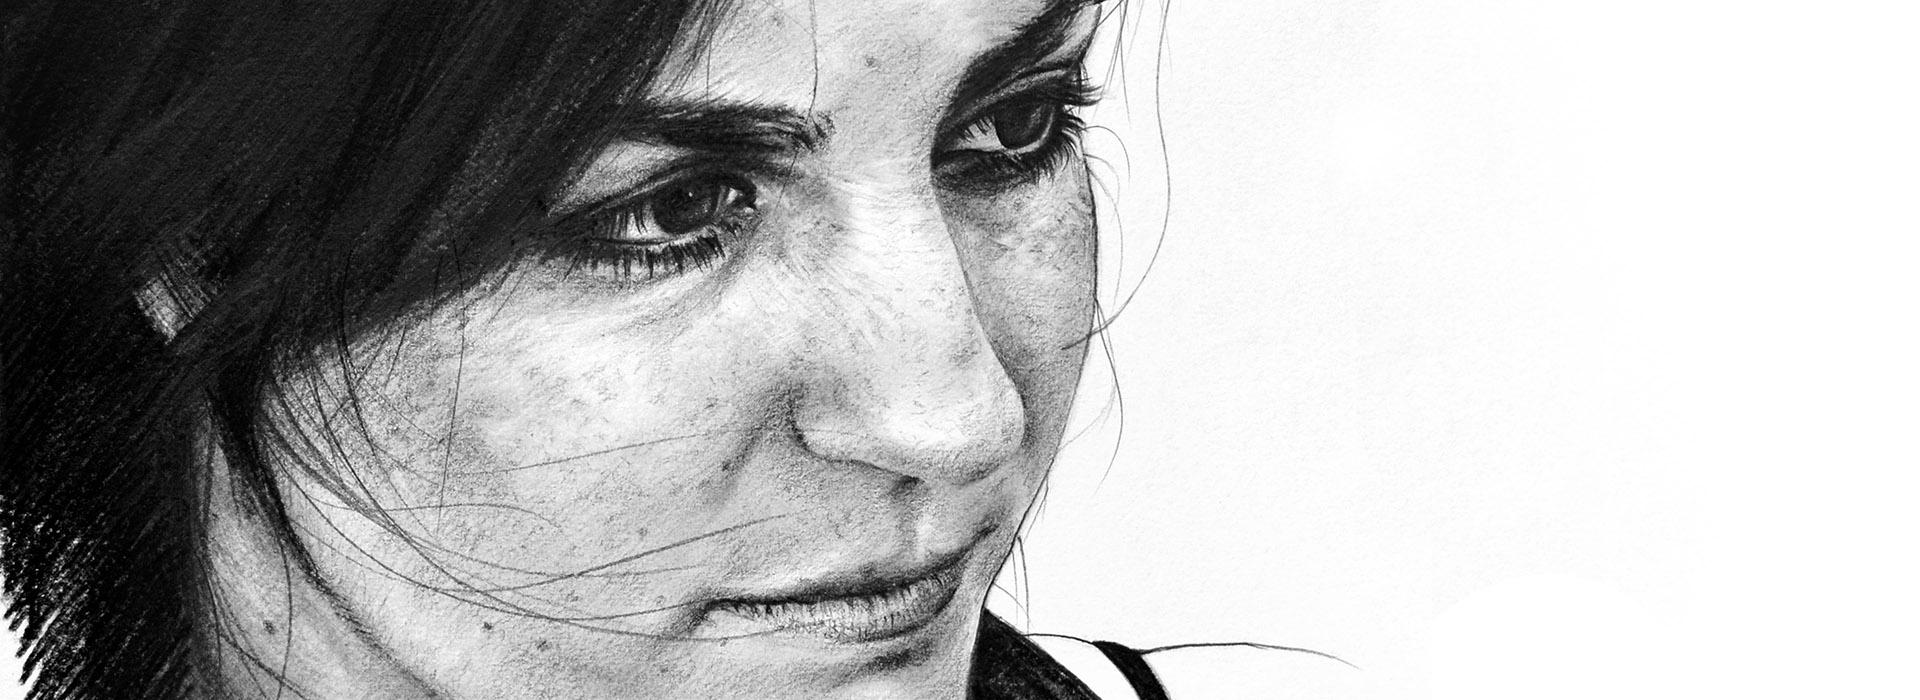 Dibujo a lápiz, retrato femenino. Javier Olmedo